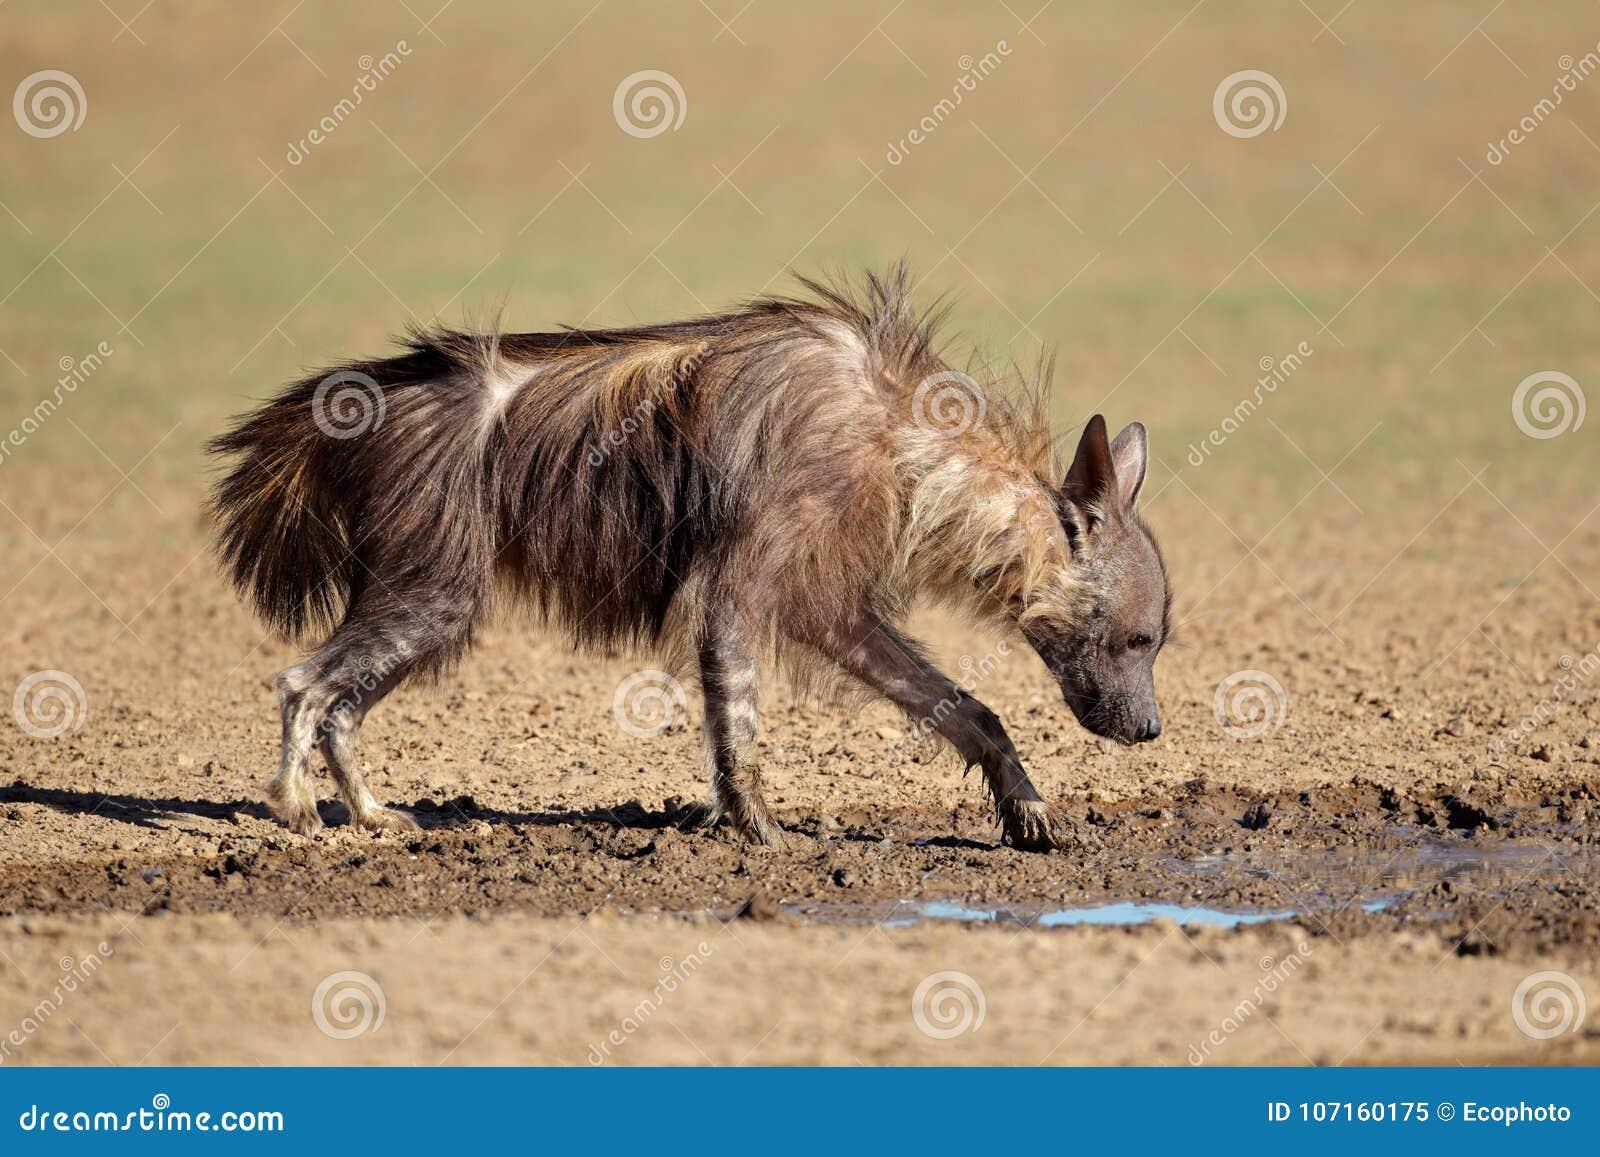 Brown hyena drinking water